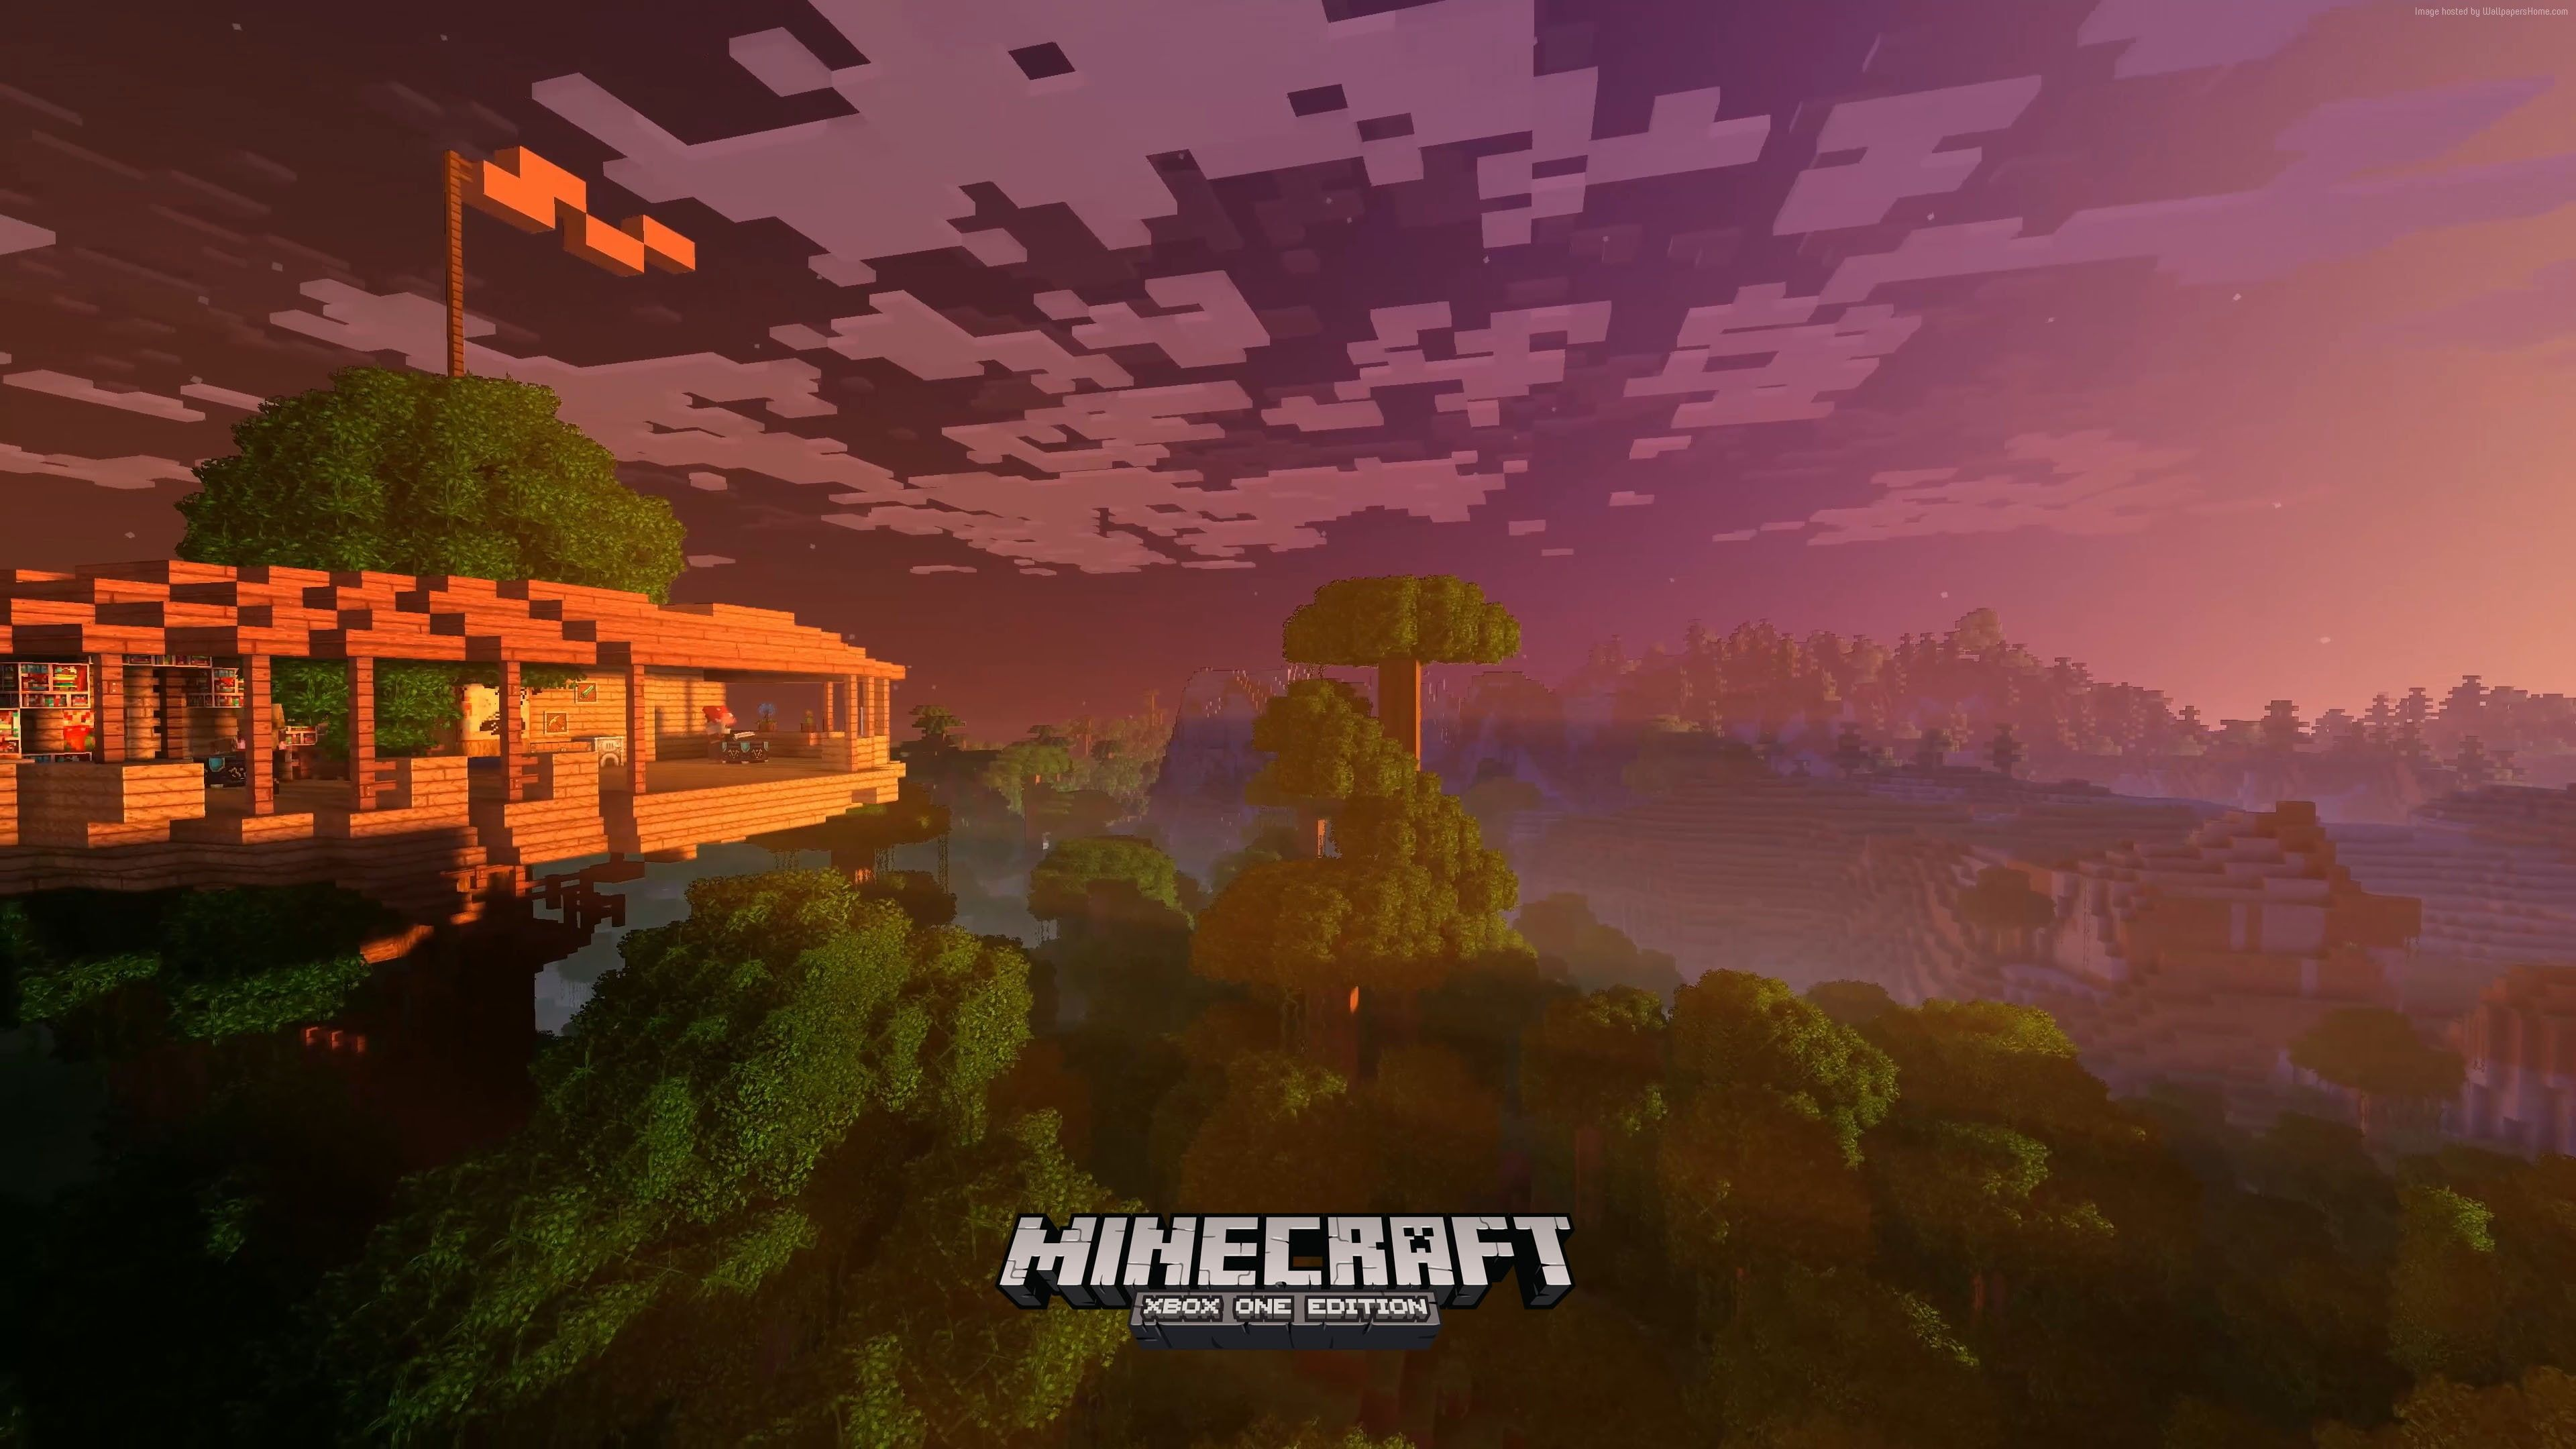 Minecraft 4k Edition Screenshot Xbox One X E3 2017 4k Wallpaper